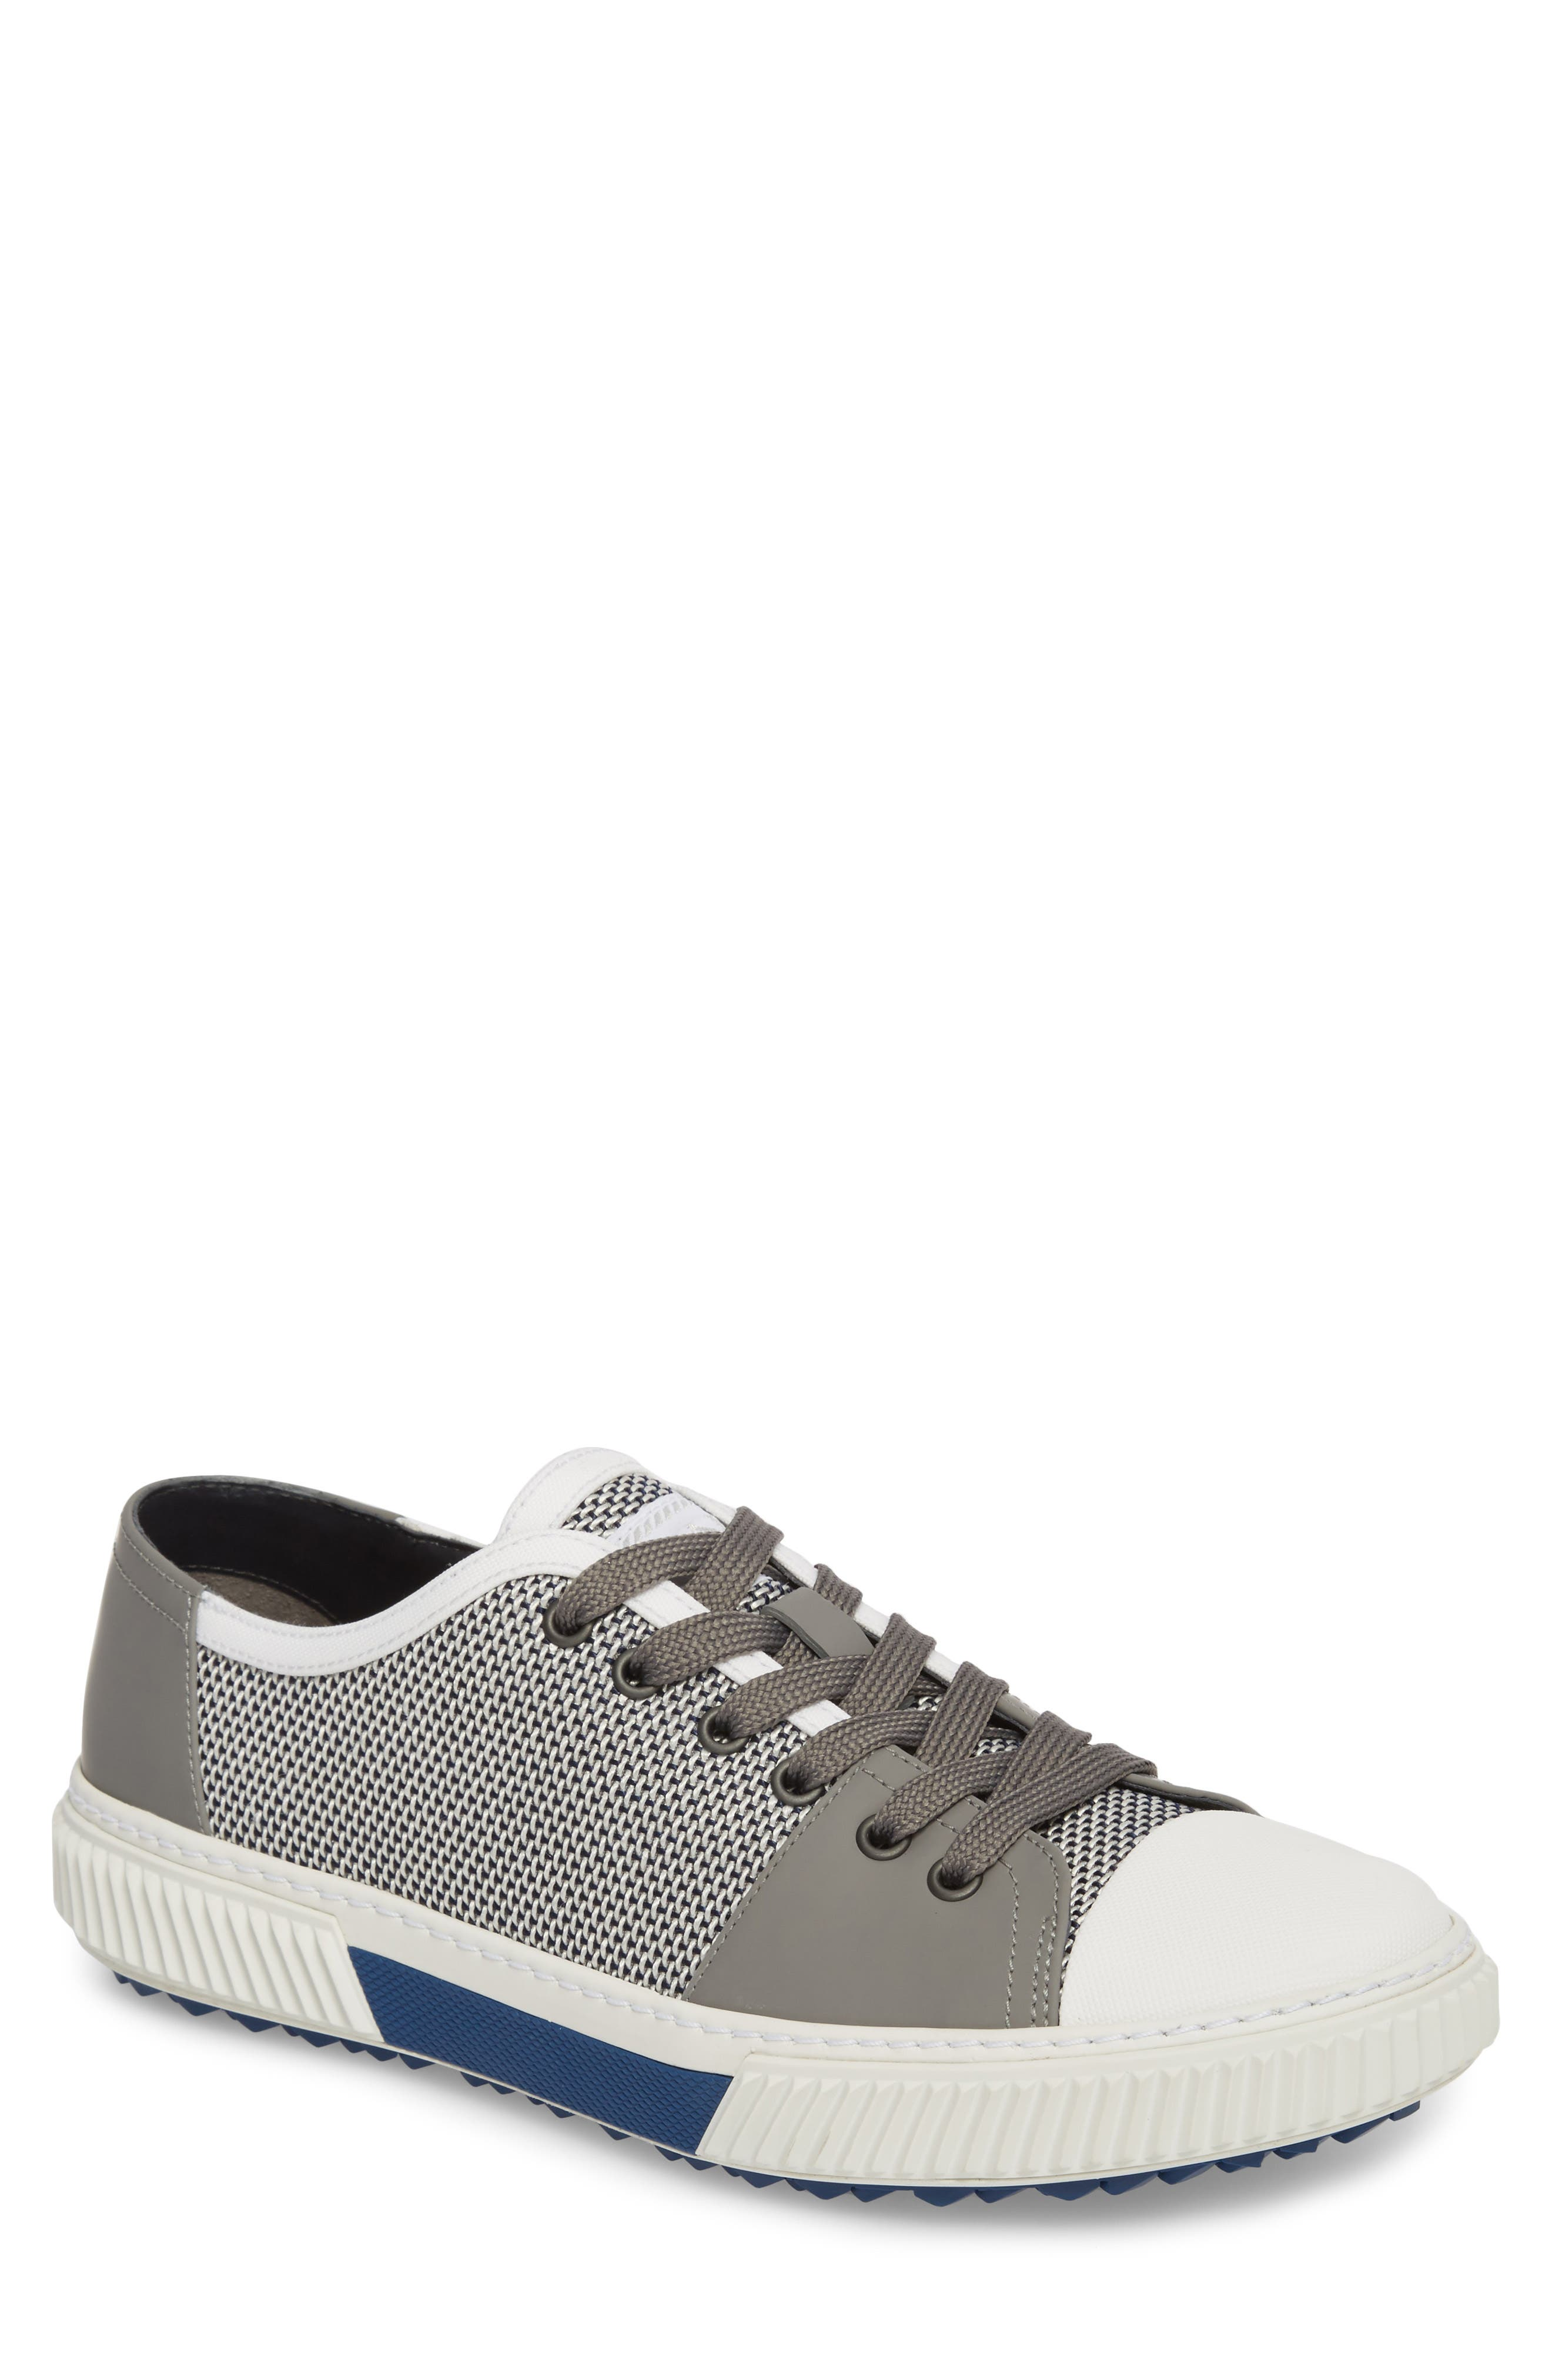 Linea Rossa Low-Top Sneaker,                             Main thumbnail 1, color,                             Baltic White